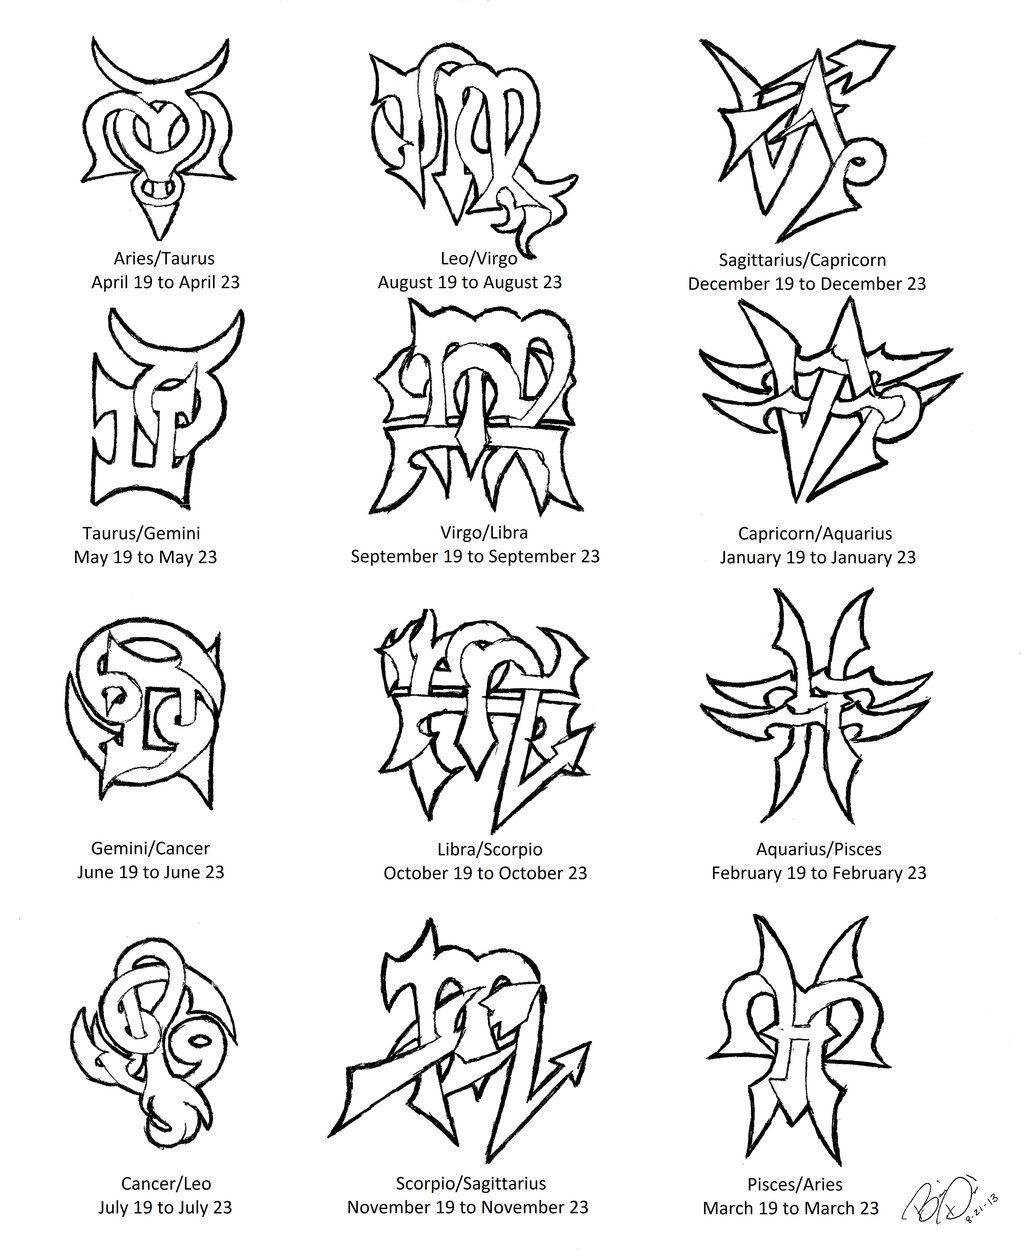 Zodiac Cusps Tattoo Designs By Wolfrunner6996 On Deviantart Zodiac Cusp Zodiac Sign Tattoos Zodiac Tattoos